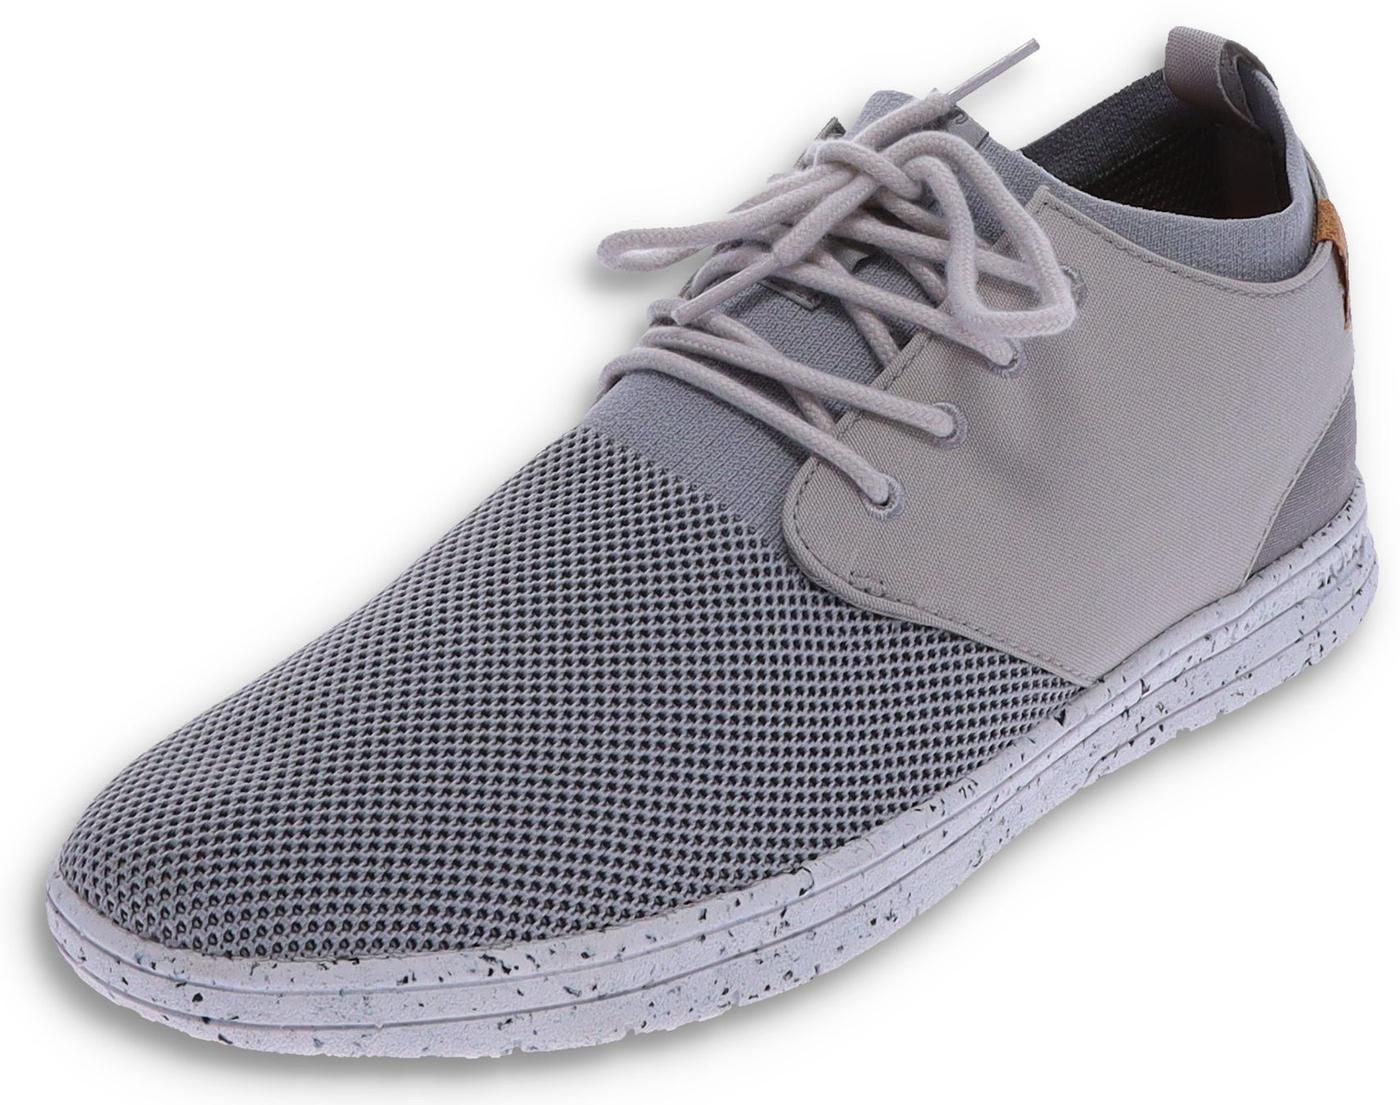 Saola SEMNOZ II Light Grey vegan men's sneaker - grey